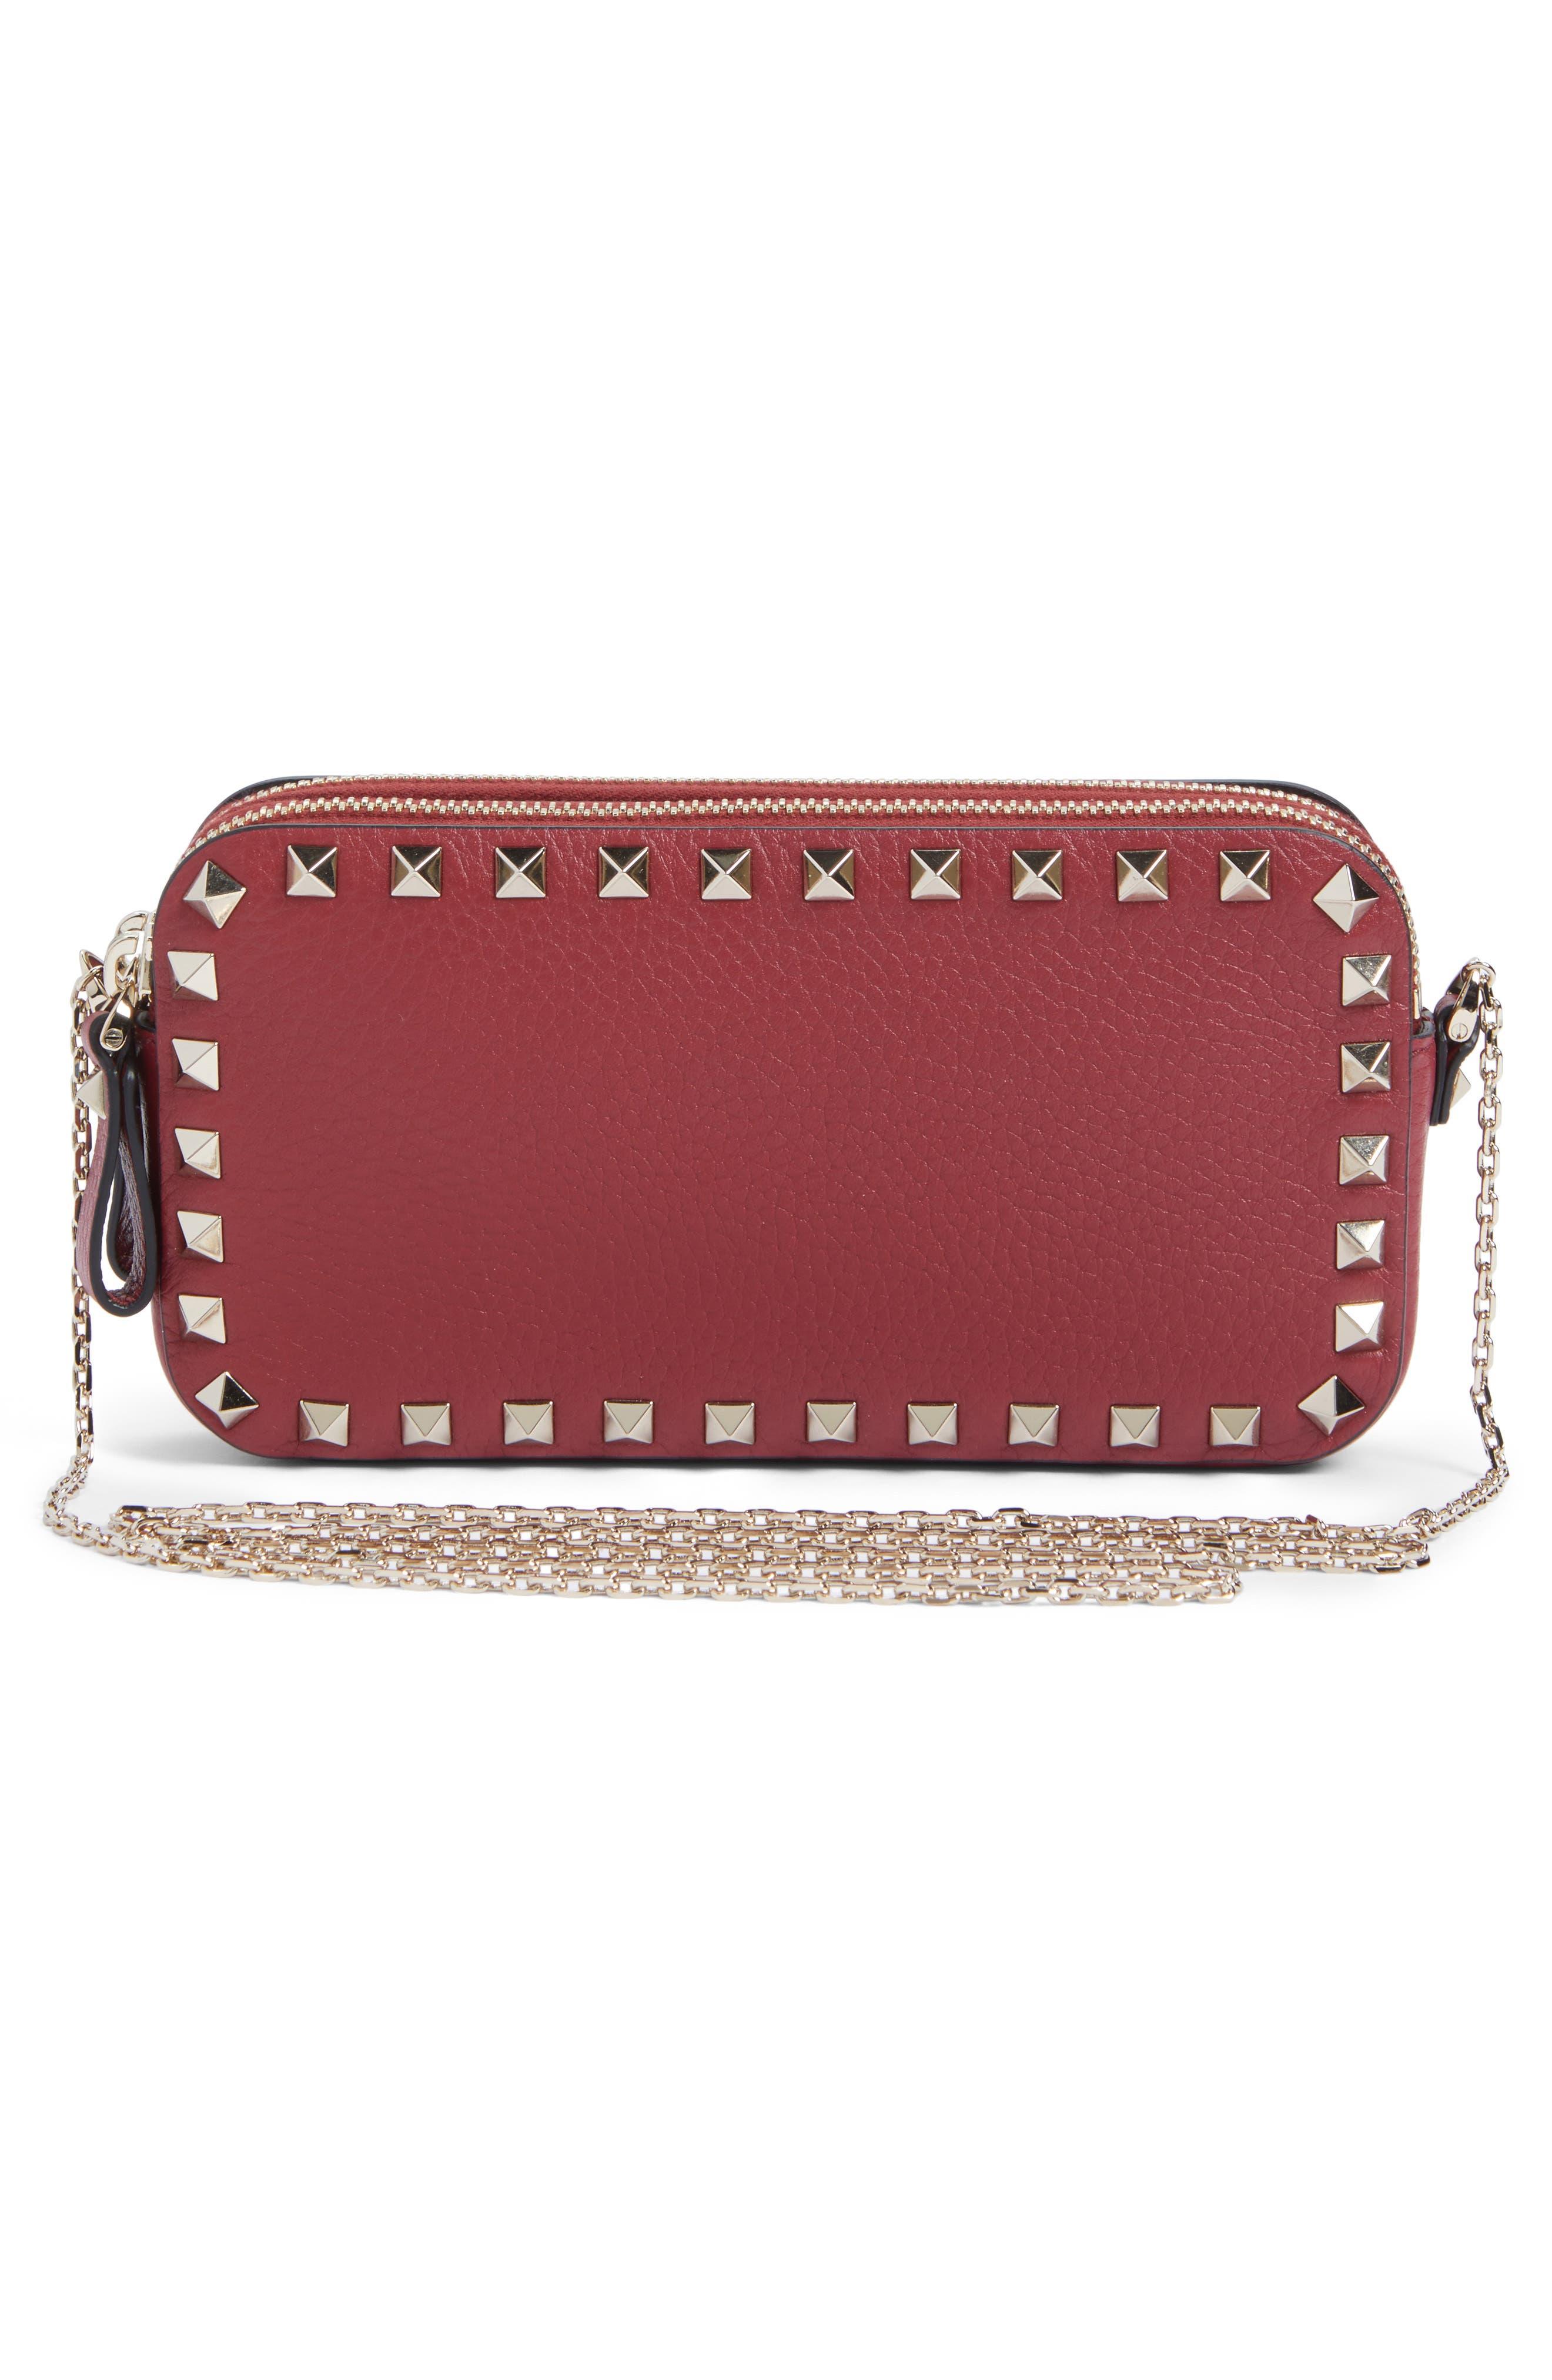 VALENTINO GARAVANI, Rockstud Leather Crossbody Bag, Alternate thumbnail 3, color, RUBIN